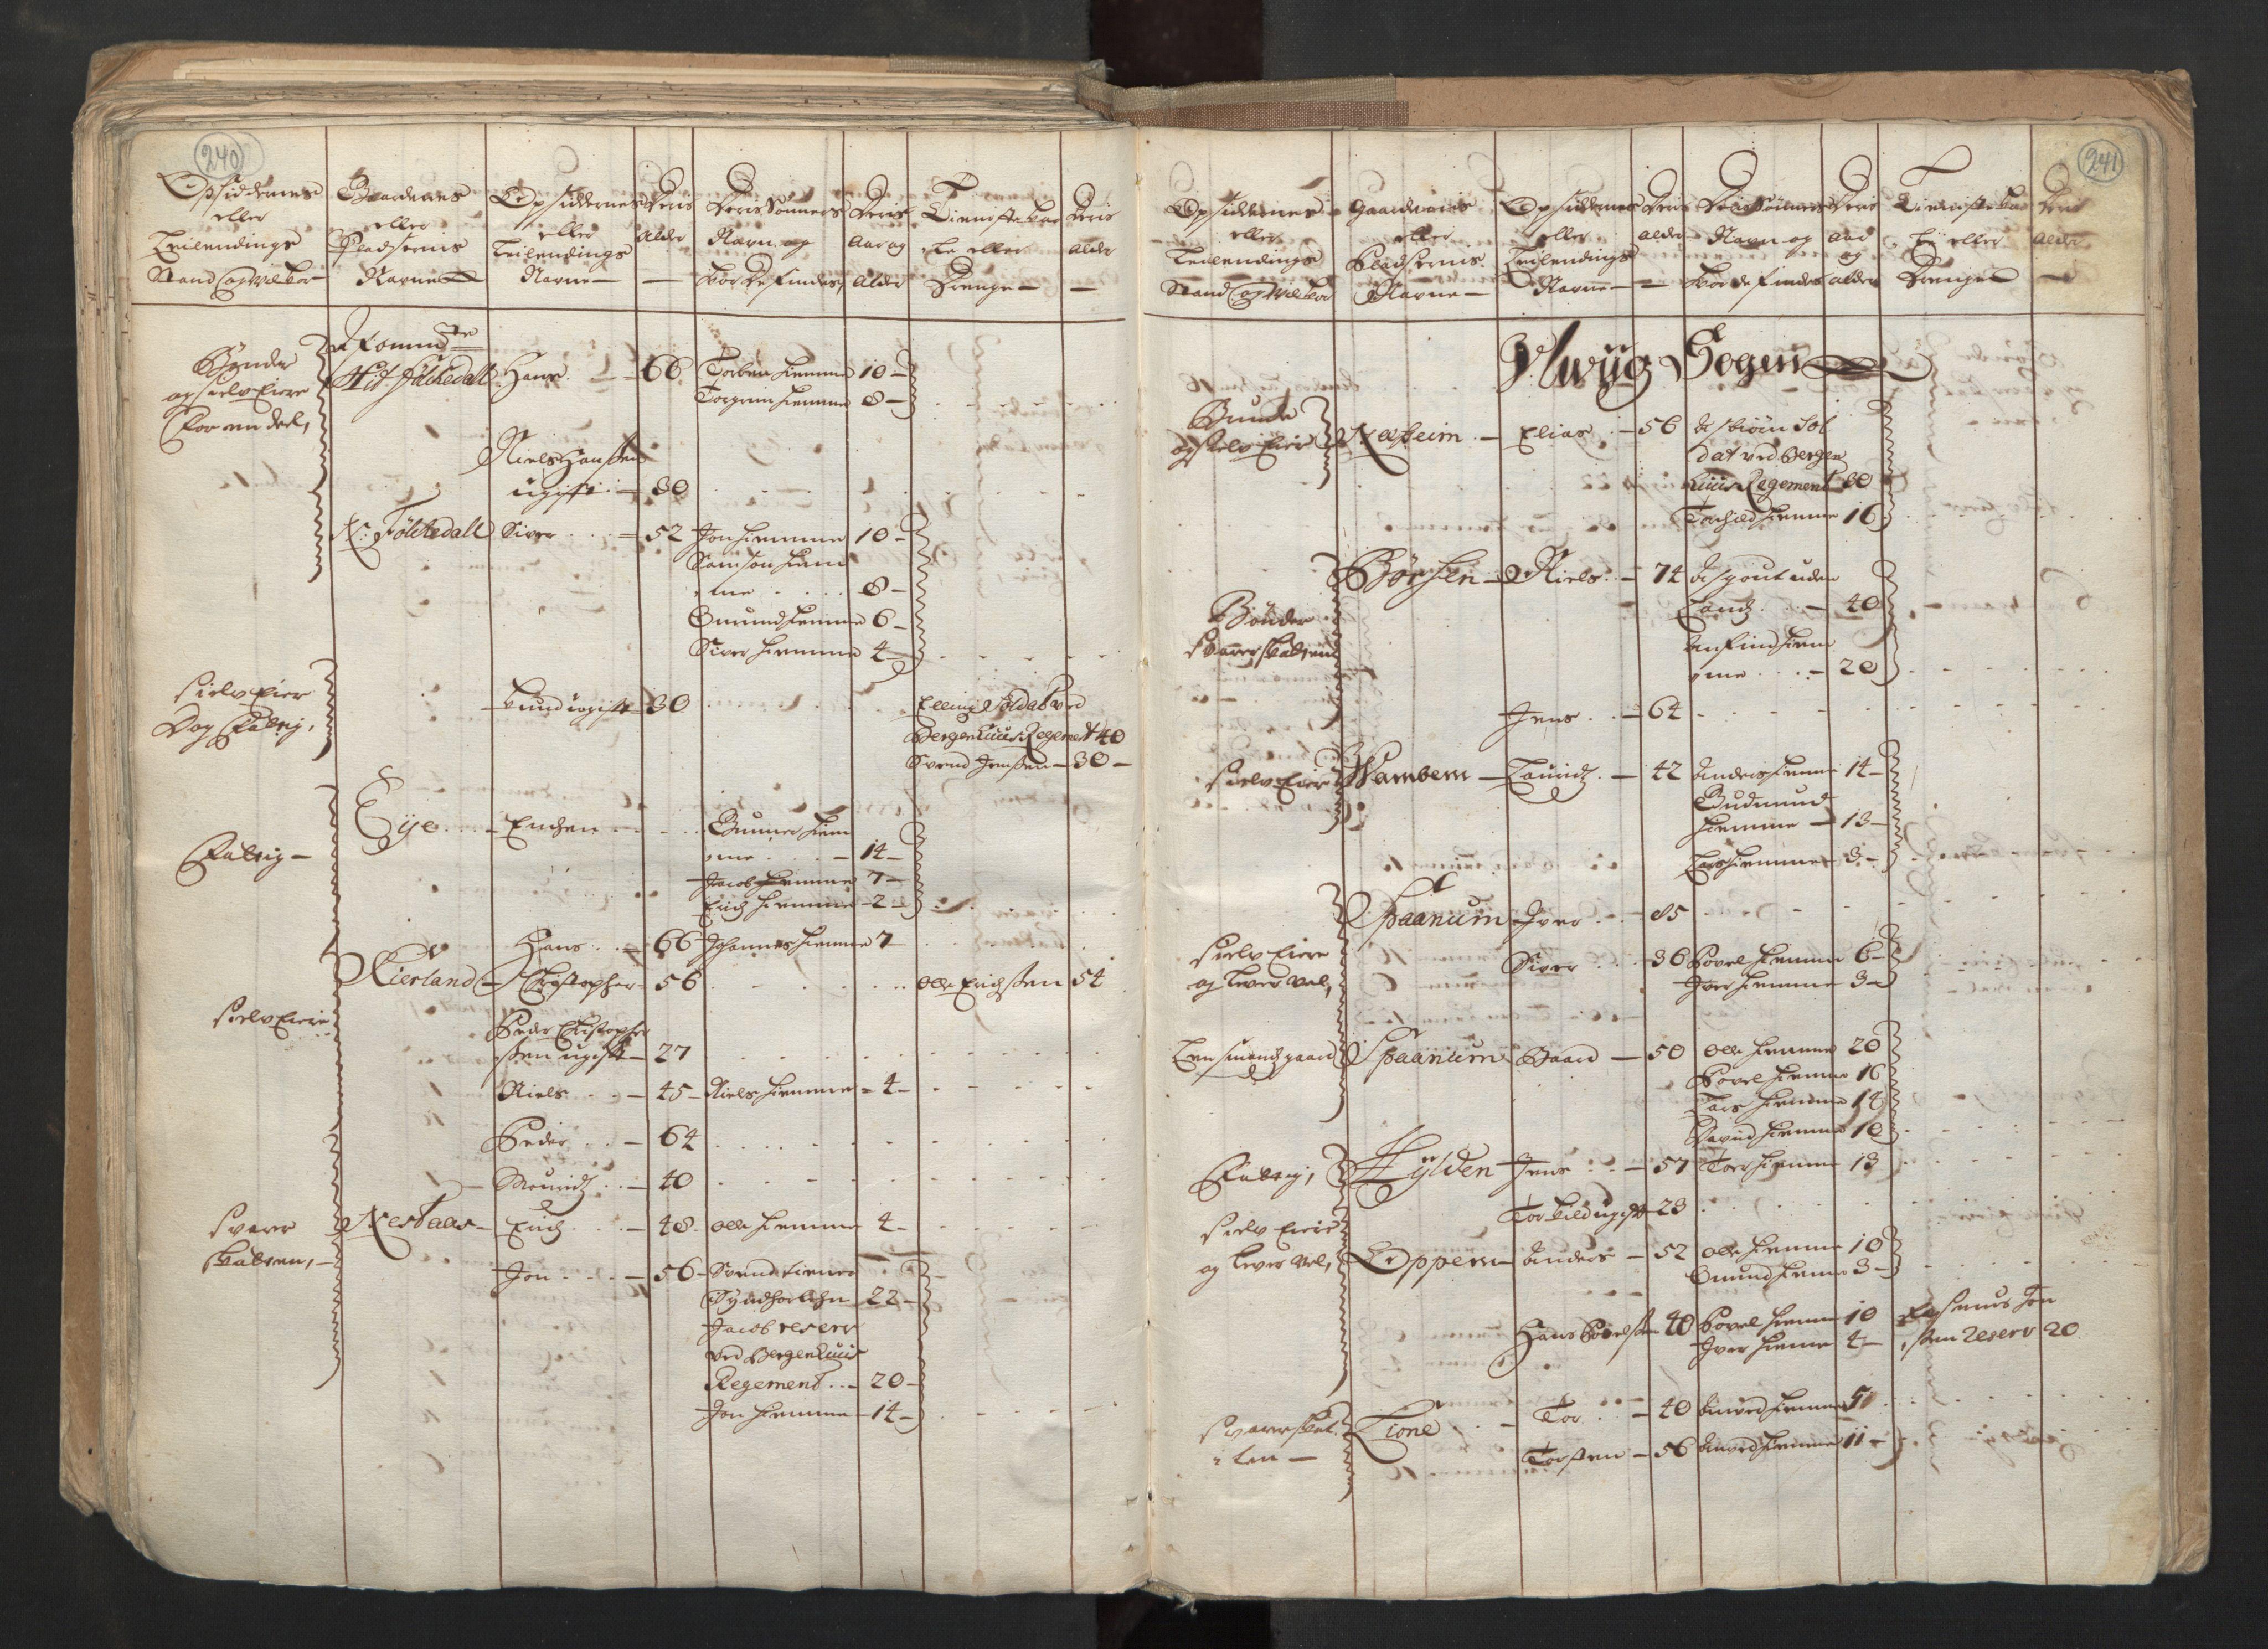 RA, Manntallet 1701, nr. 6: Sunnhordland fogderi og Hardanger fogderi, 1701, s. 240-241